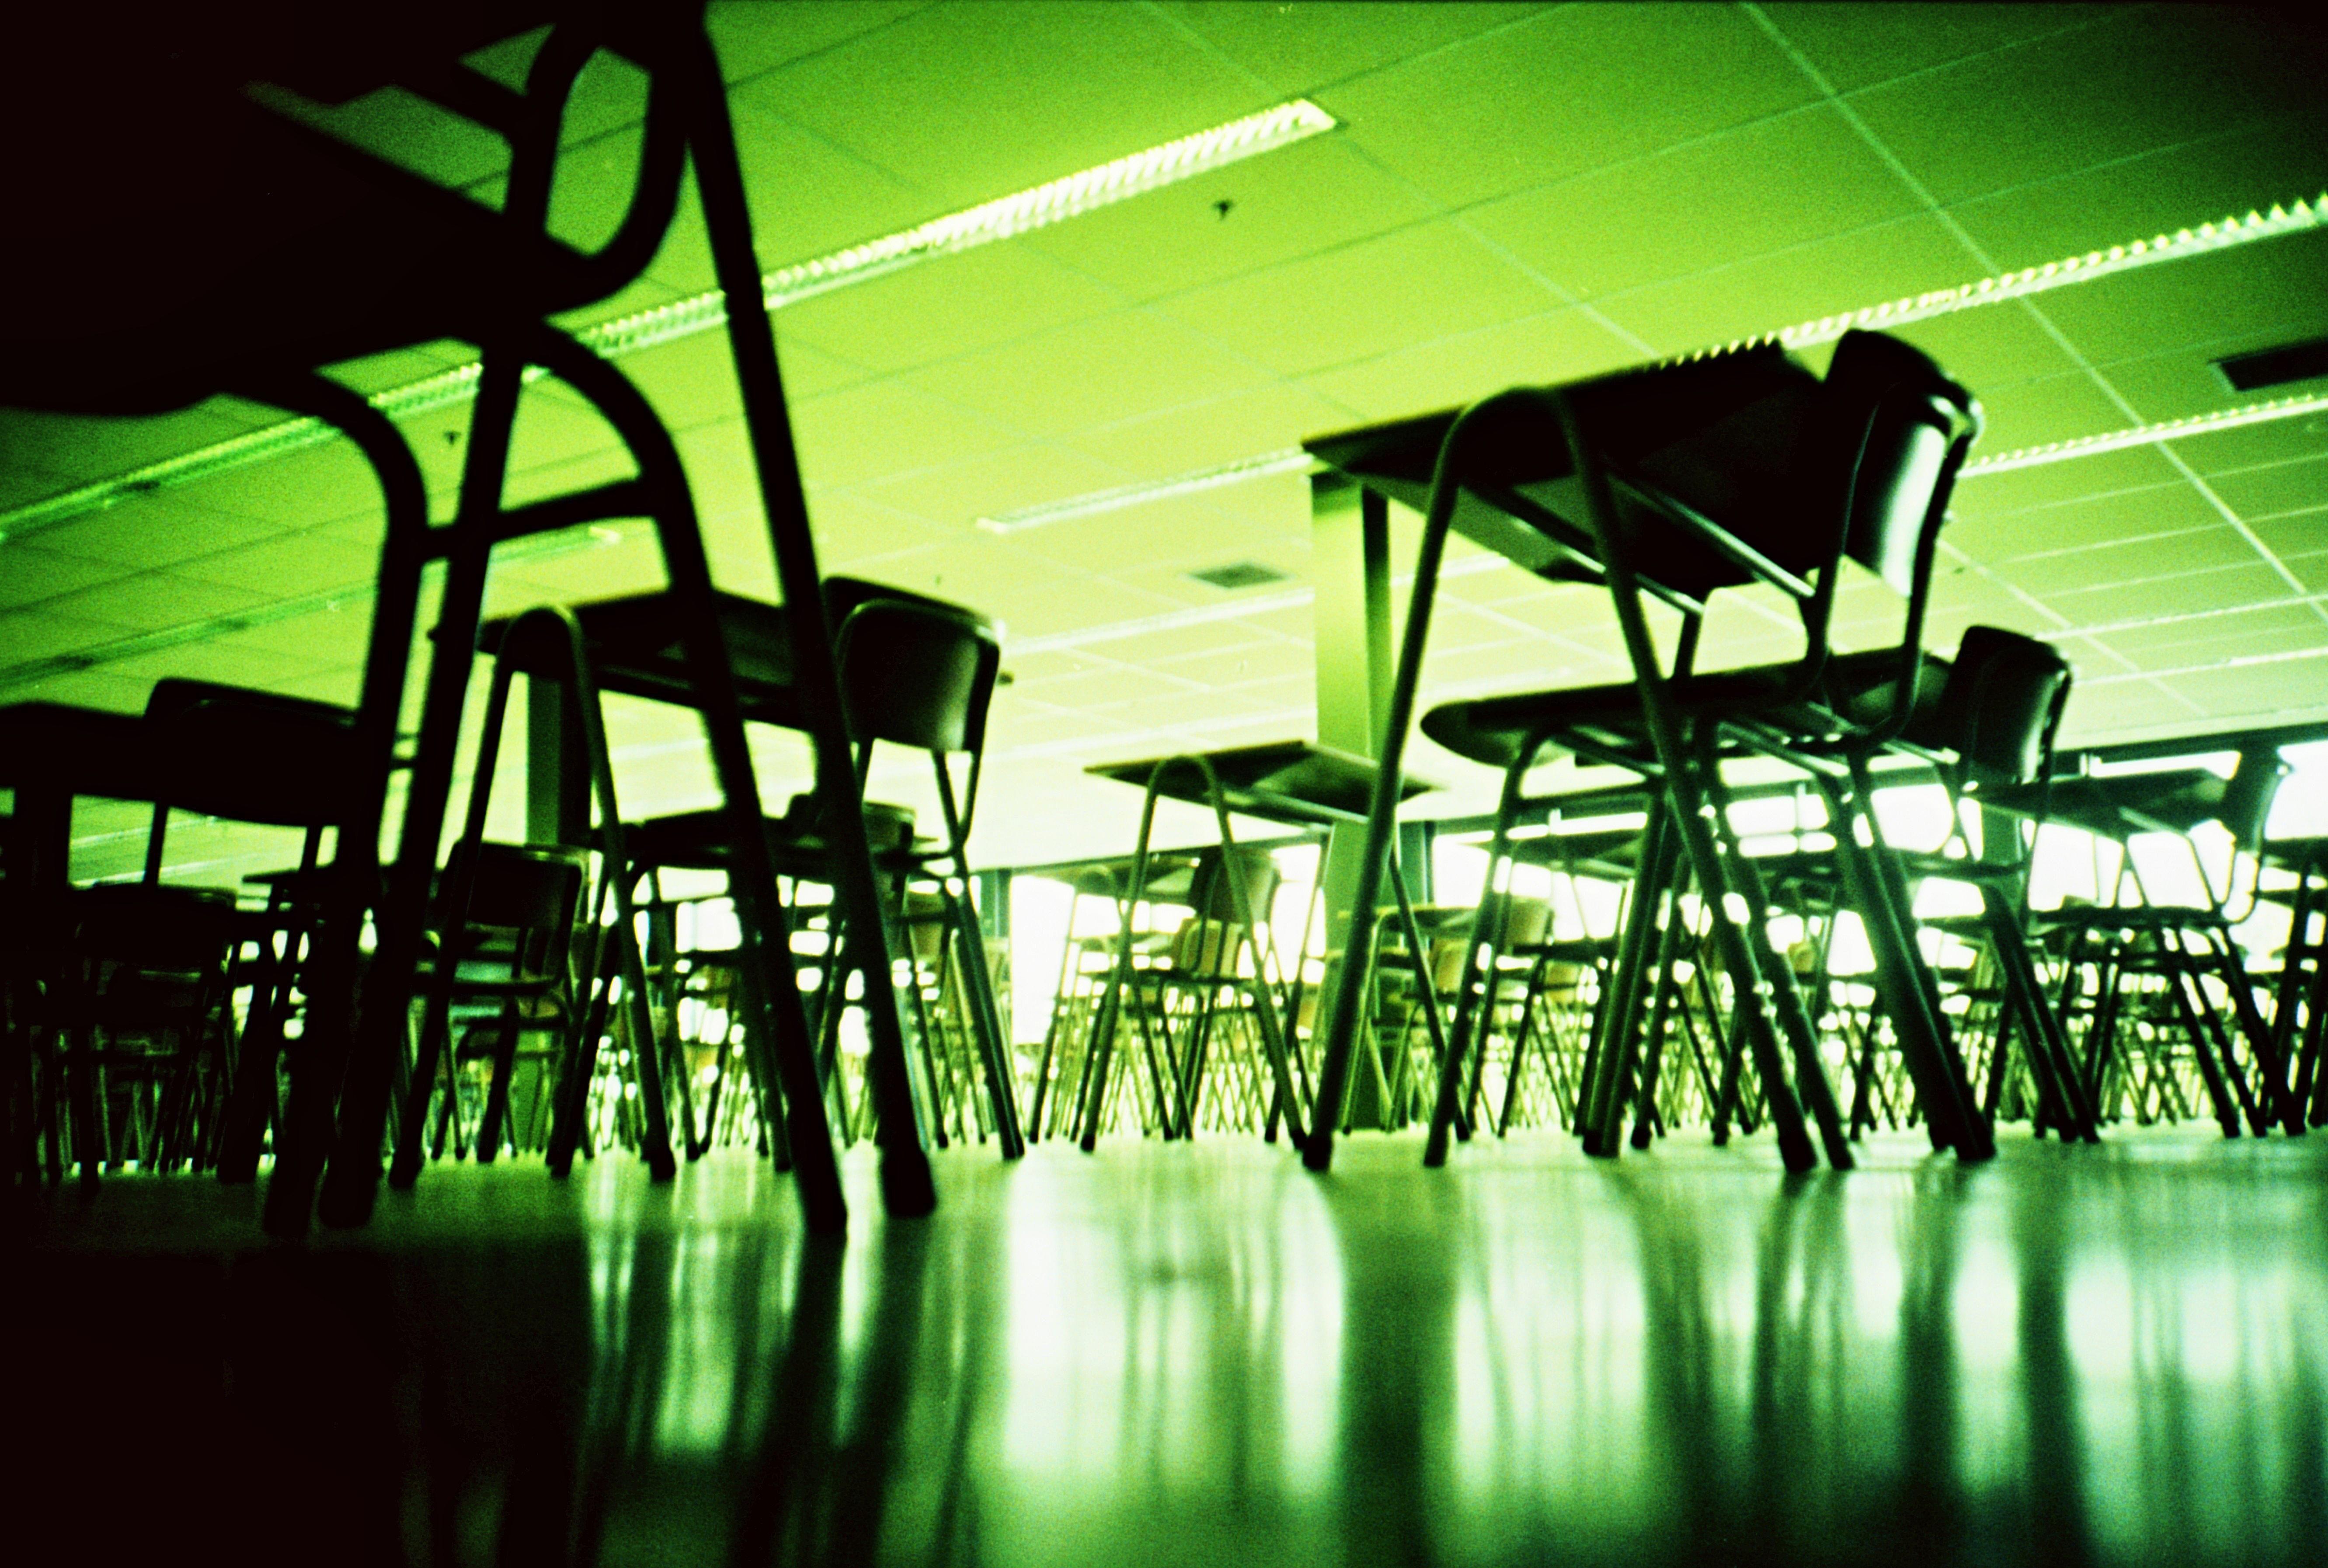 Colette bennett thoughtco benefits and drawbacks of classroom arrangements xflitez Choice Image